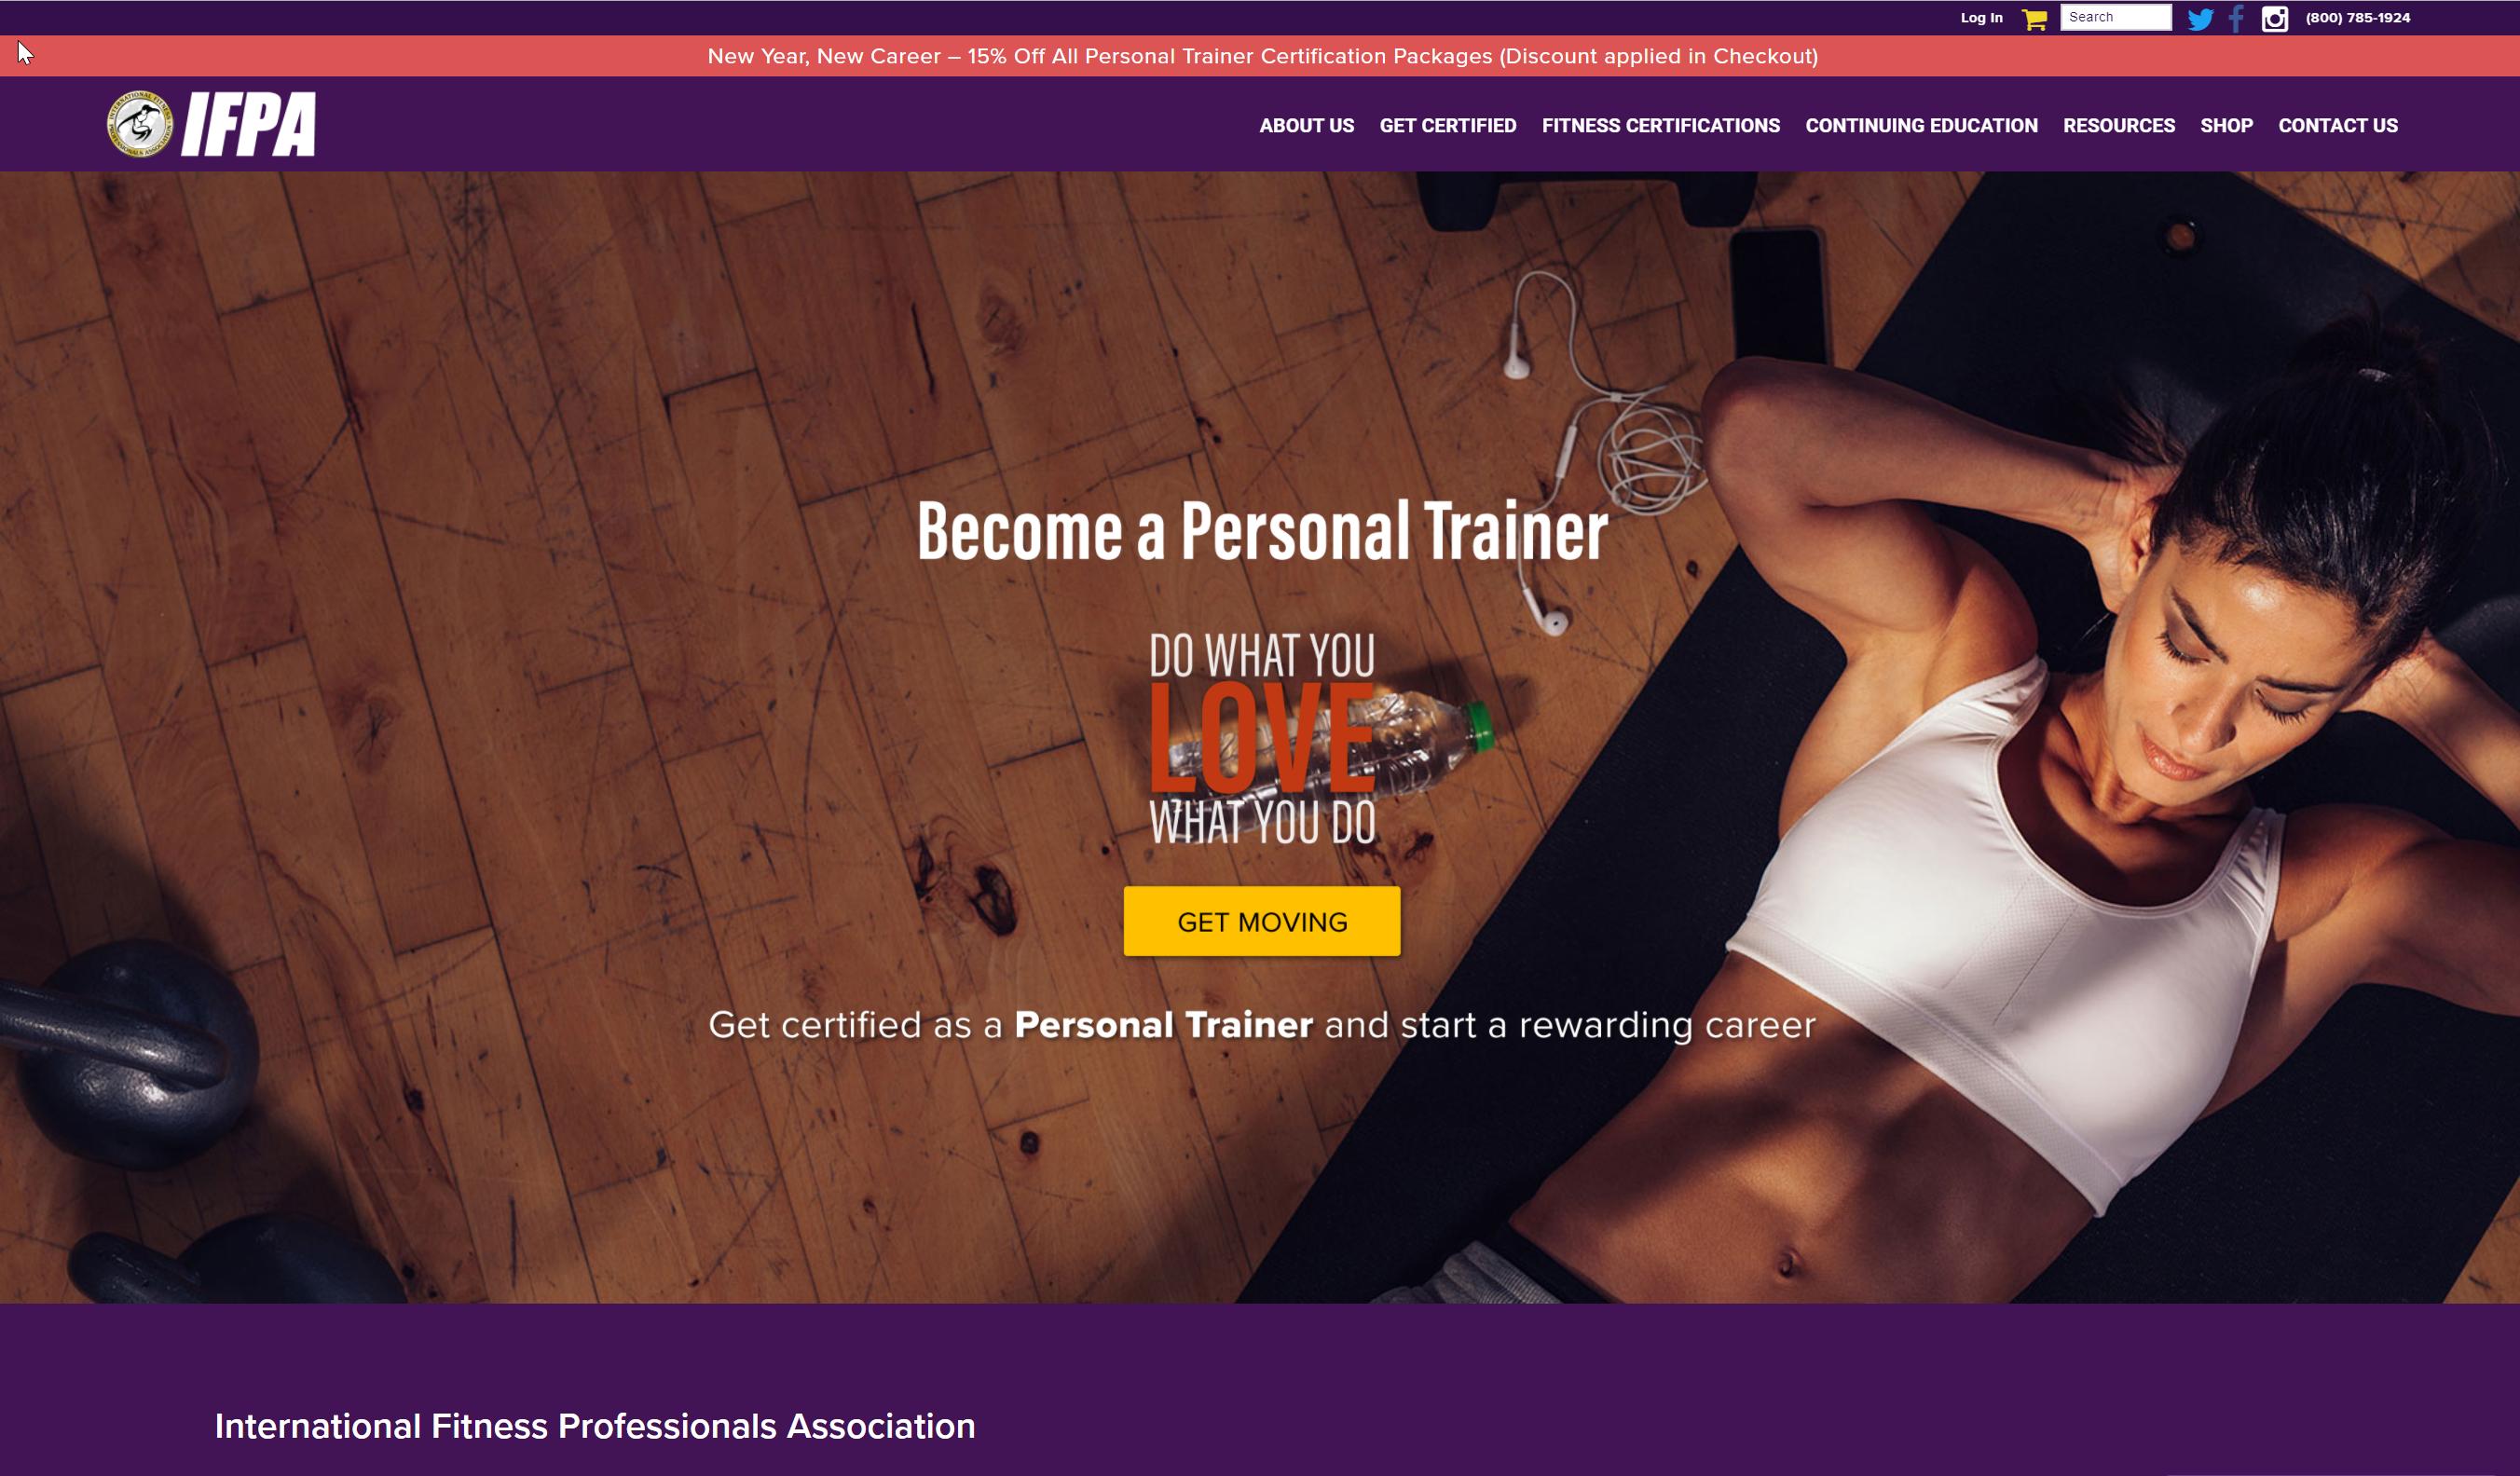 IFPA website